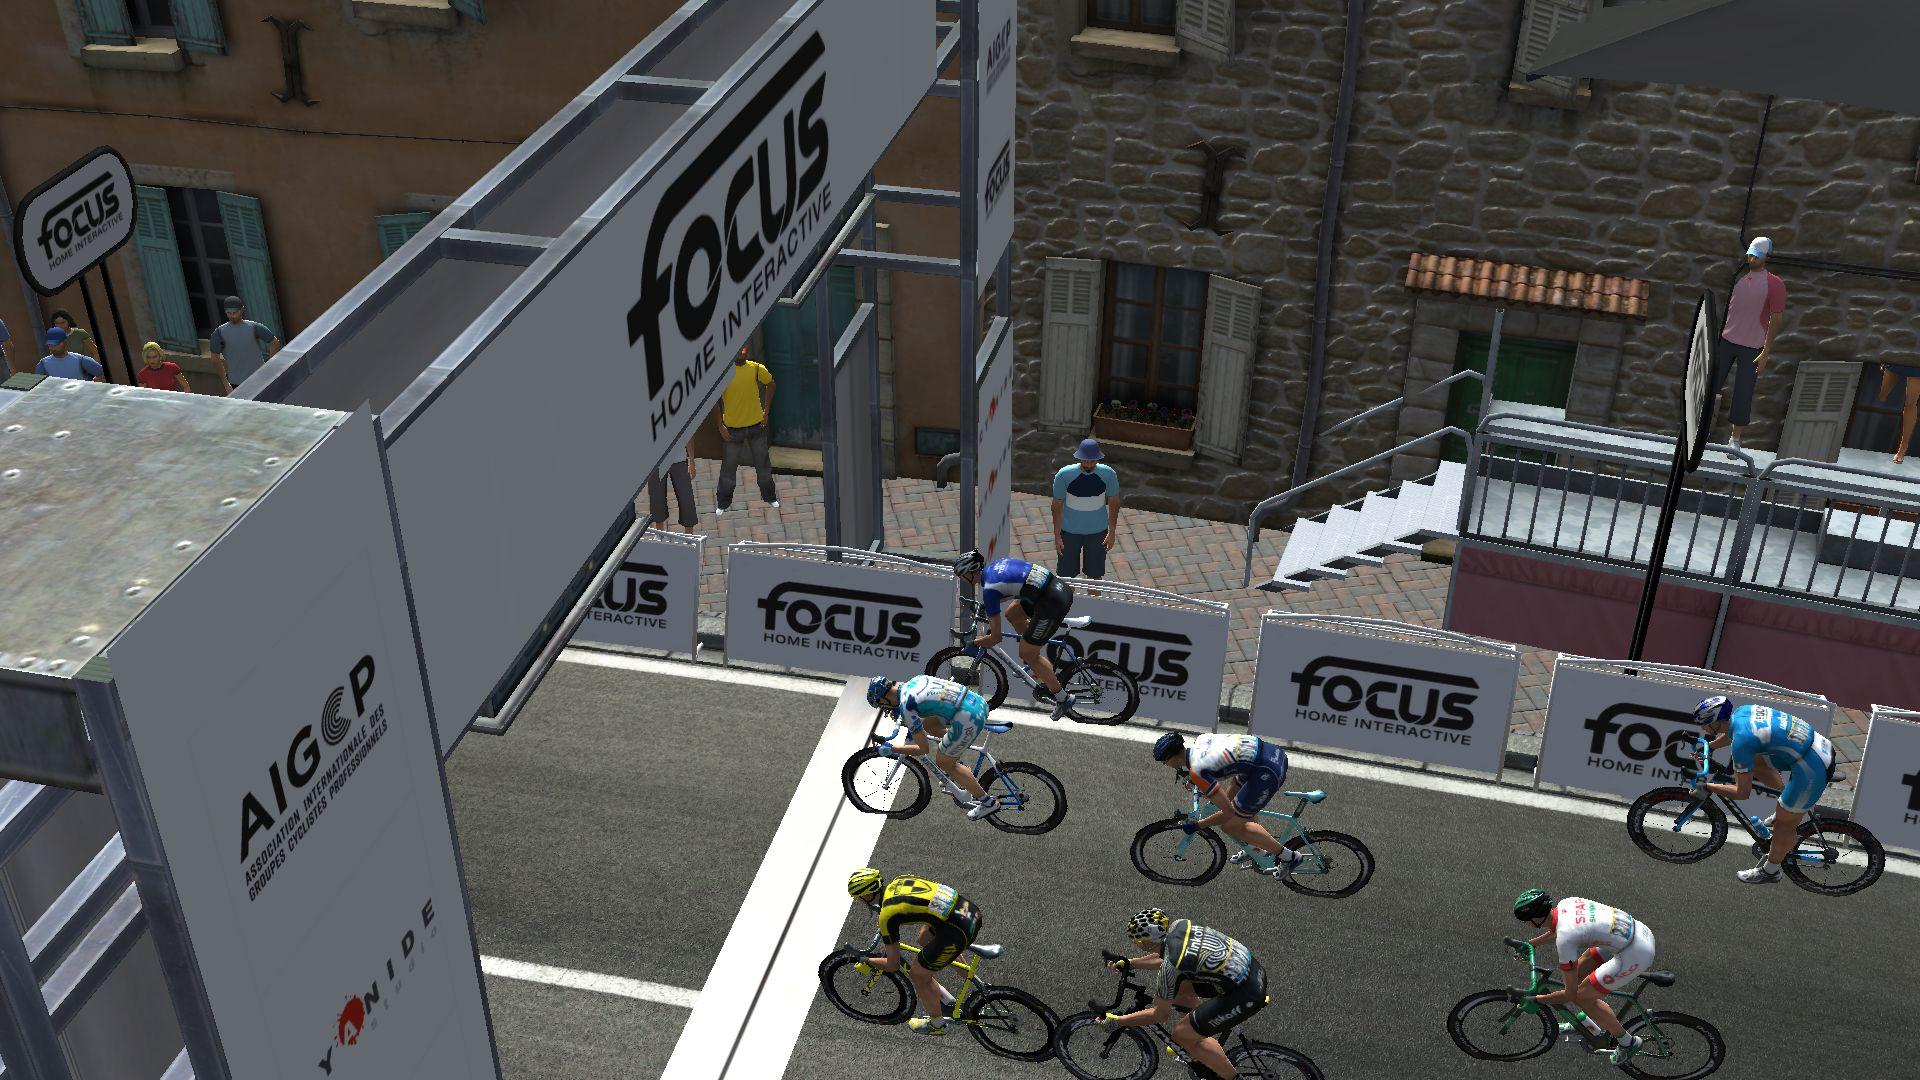 pcmdaily.com/images/mg/2019/Races/GTM/Giro/mg19_giro_10_PCM0144.jpg